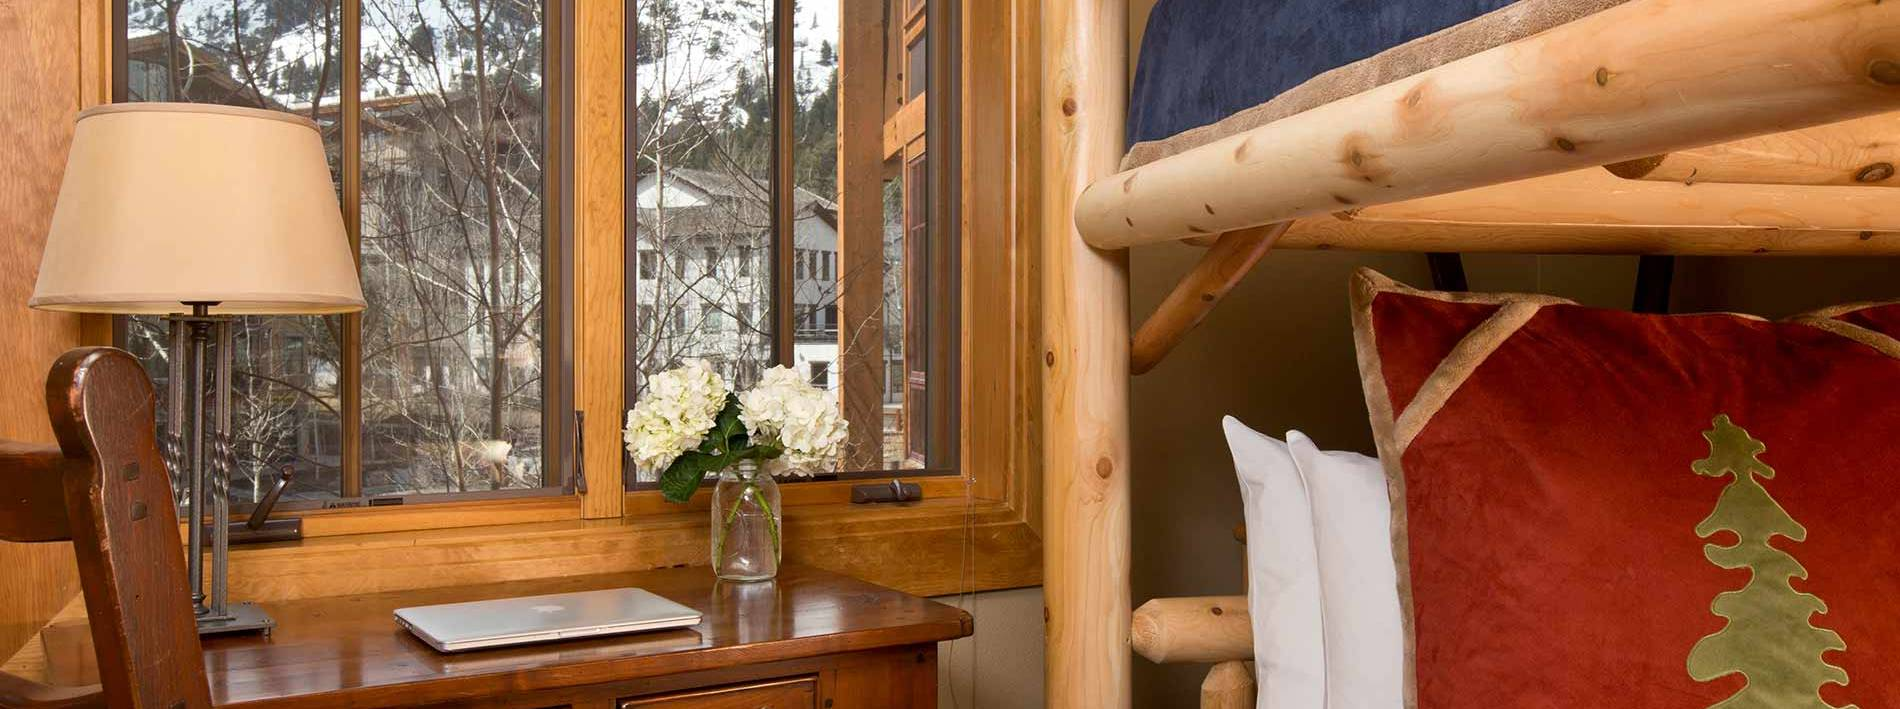 3285 West Village Drive #304,Teton Village,Wyoming,3 Bedrooms Bedrooms,3.5 BathroomsBathrooms,Private Home,3285 West Village Drive #304,1005